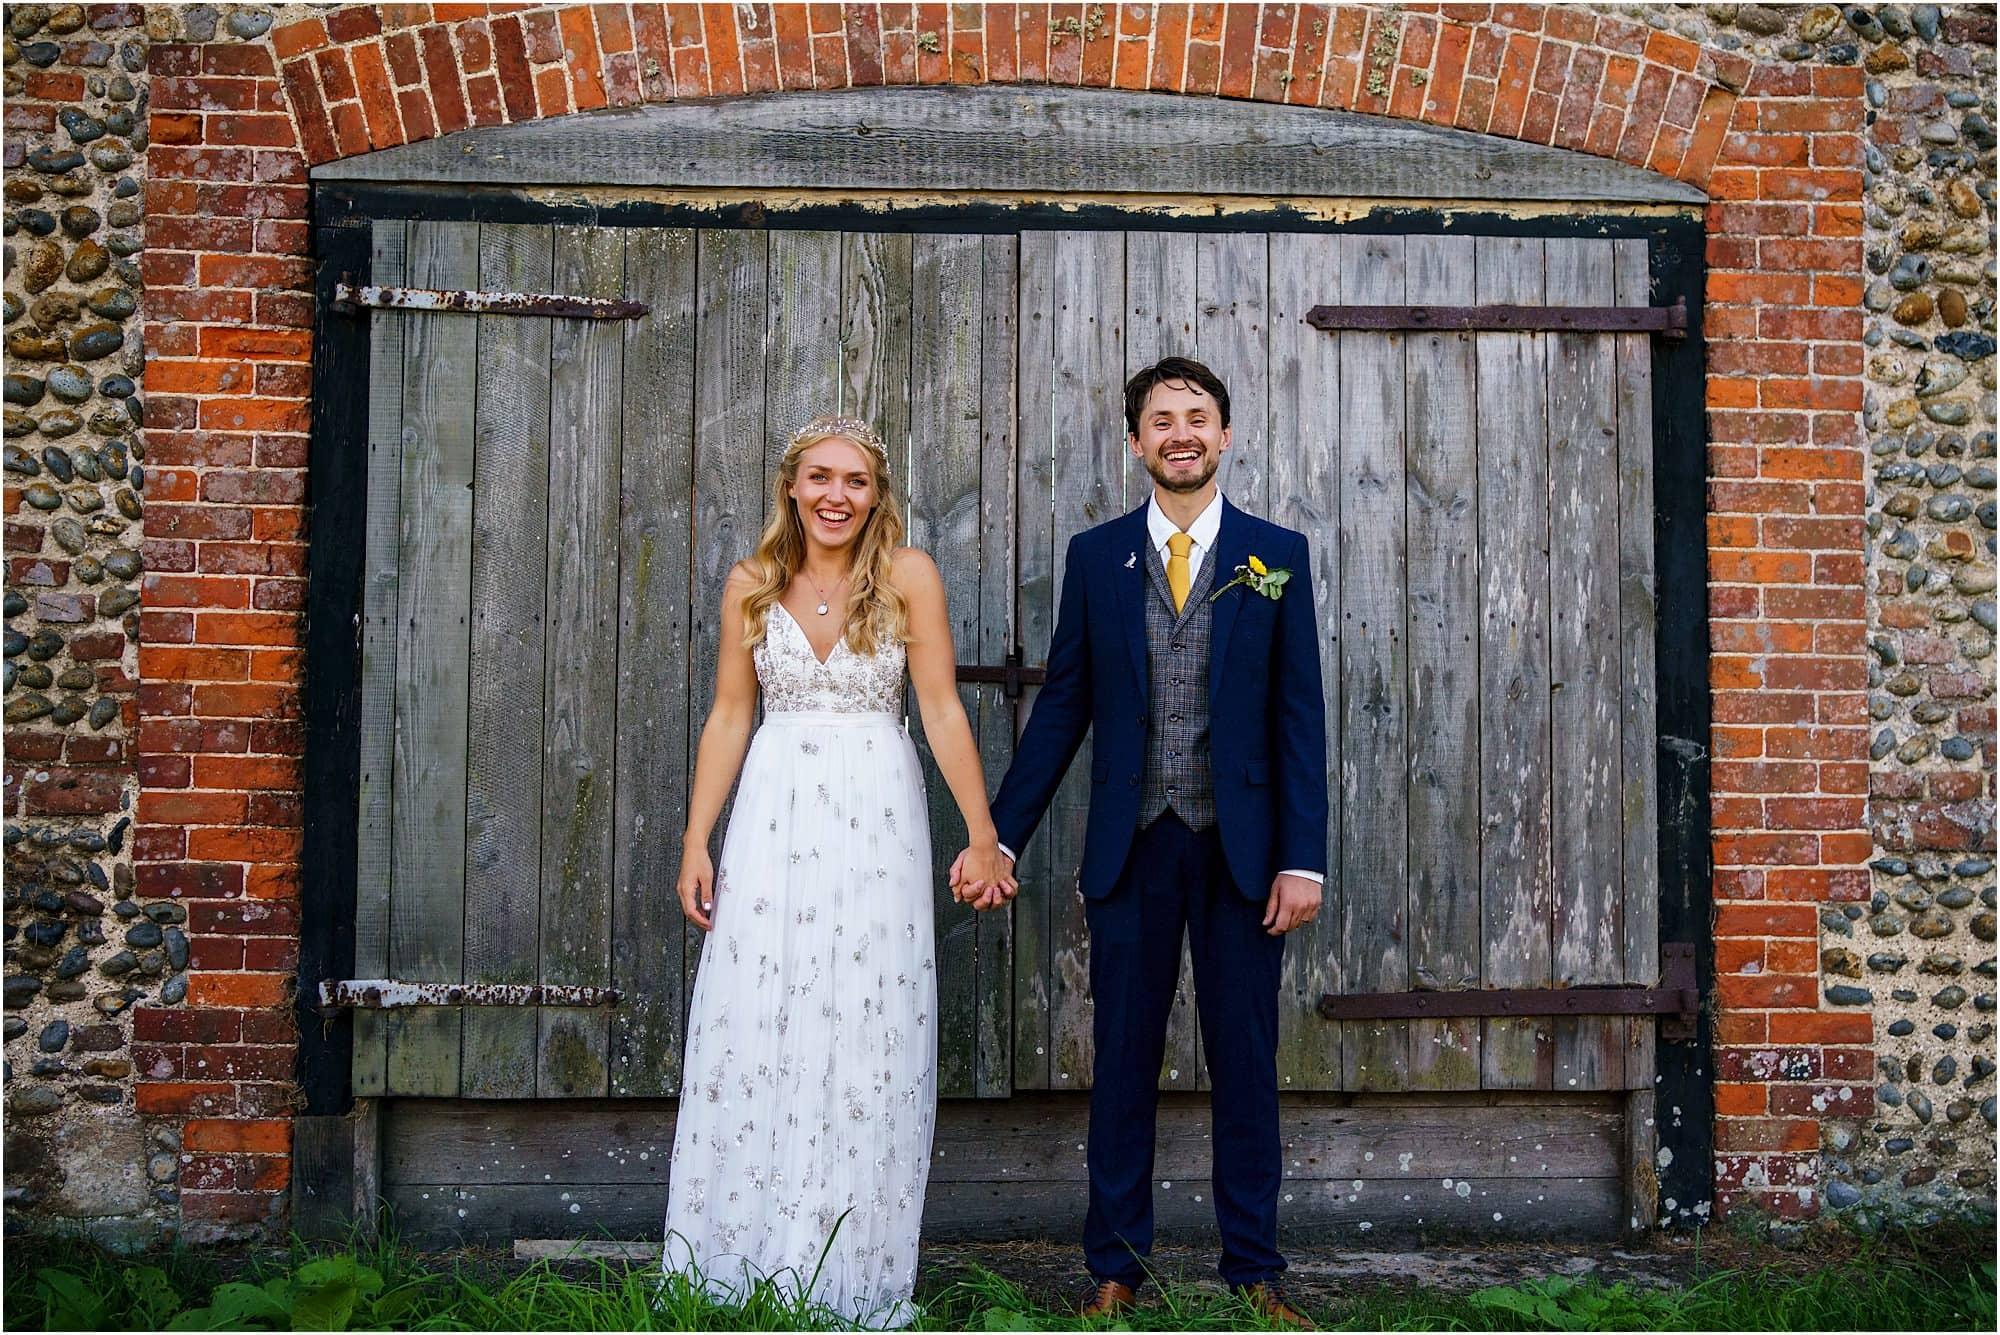 couple portrait of bride and groom at Waxham Great Barn doors